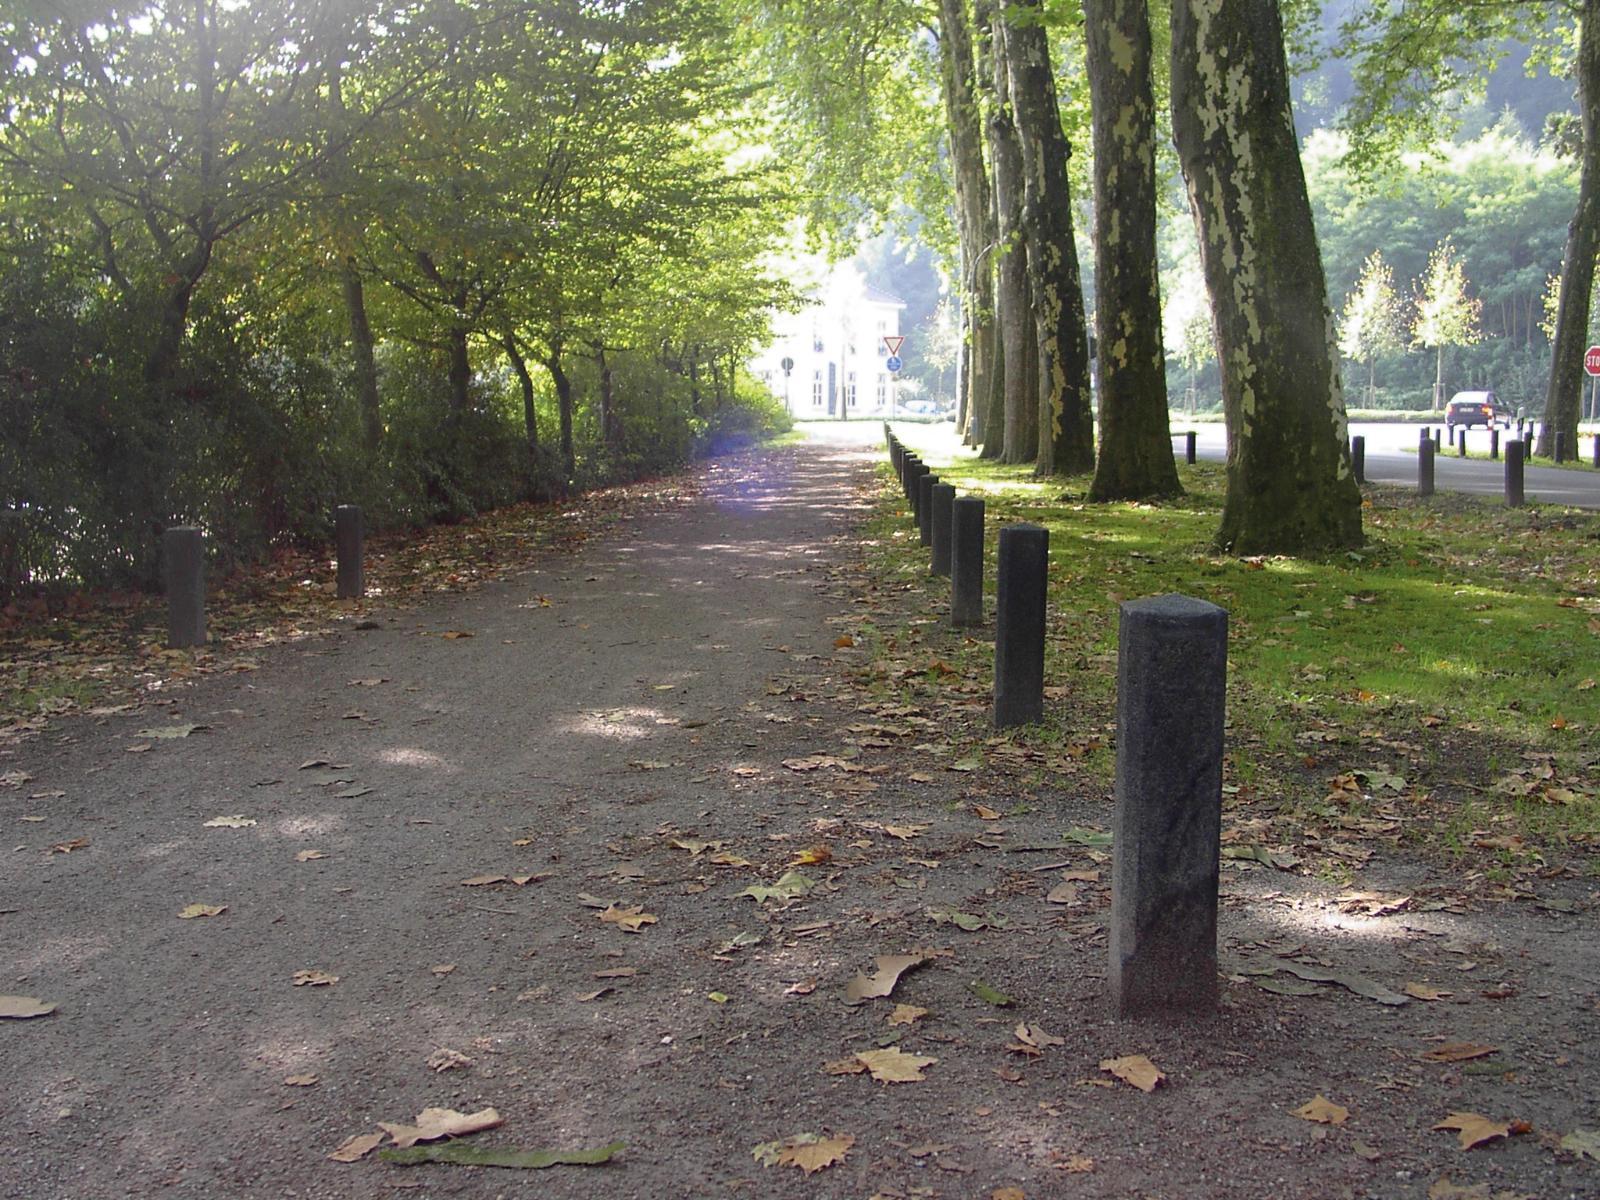 301200_Poller_Diamantkopf_Park_731